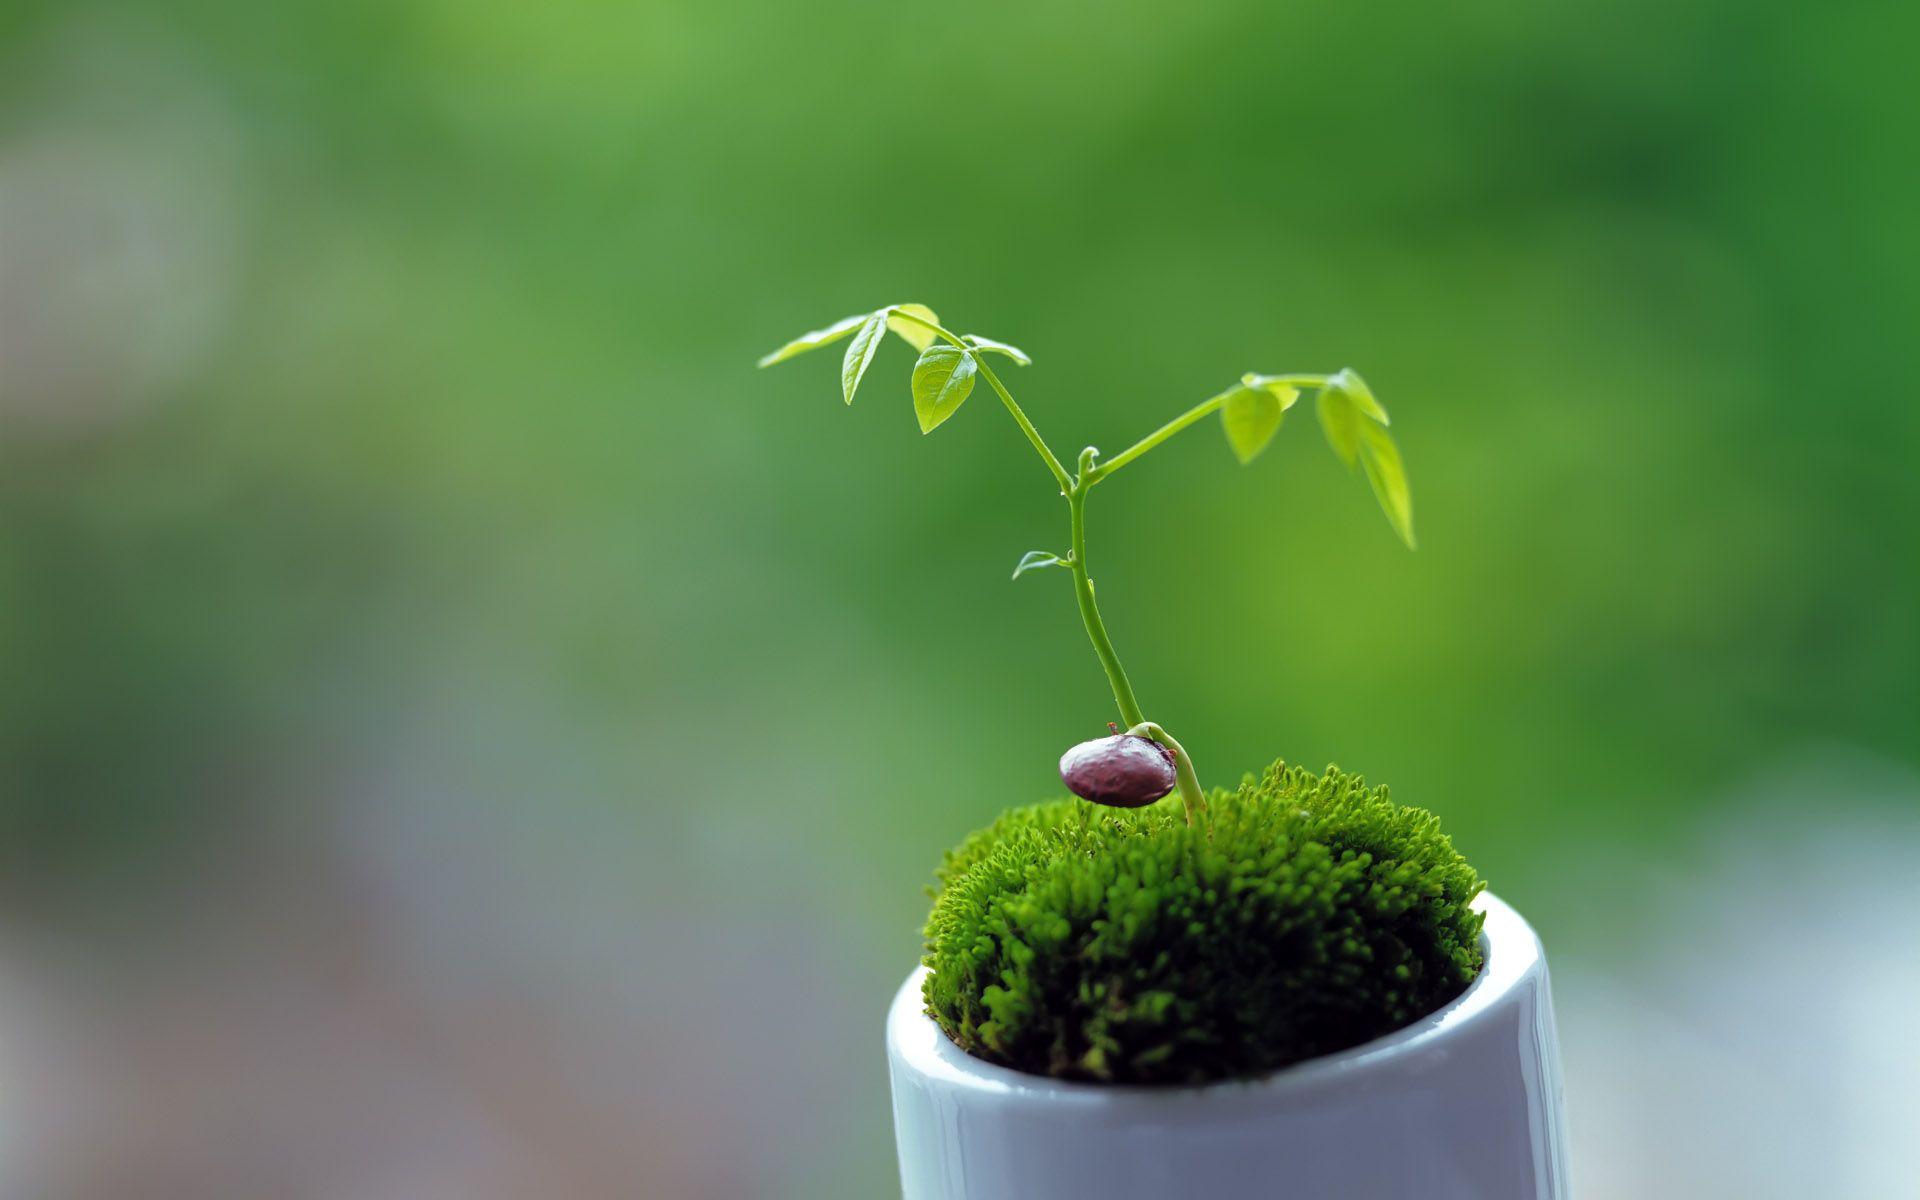 Background image 8851 - Little Plant Wallpaper Hd 8851